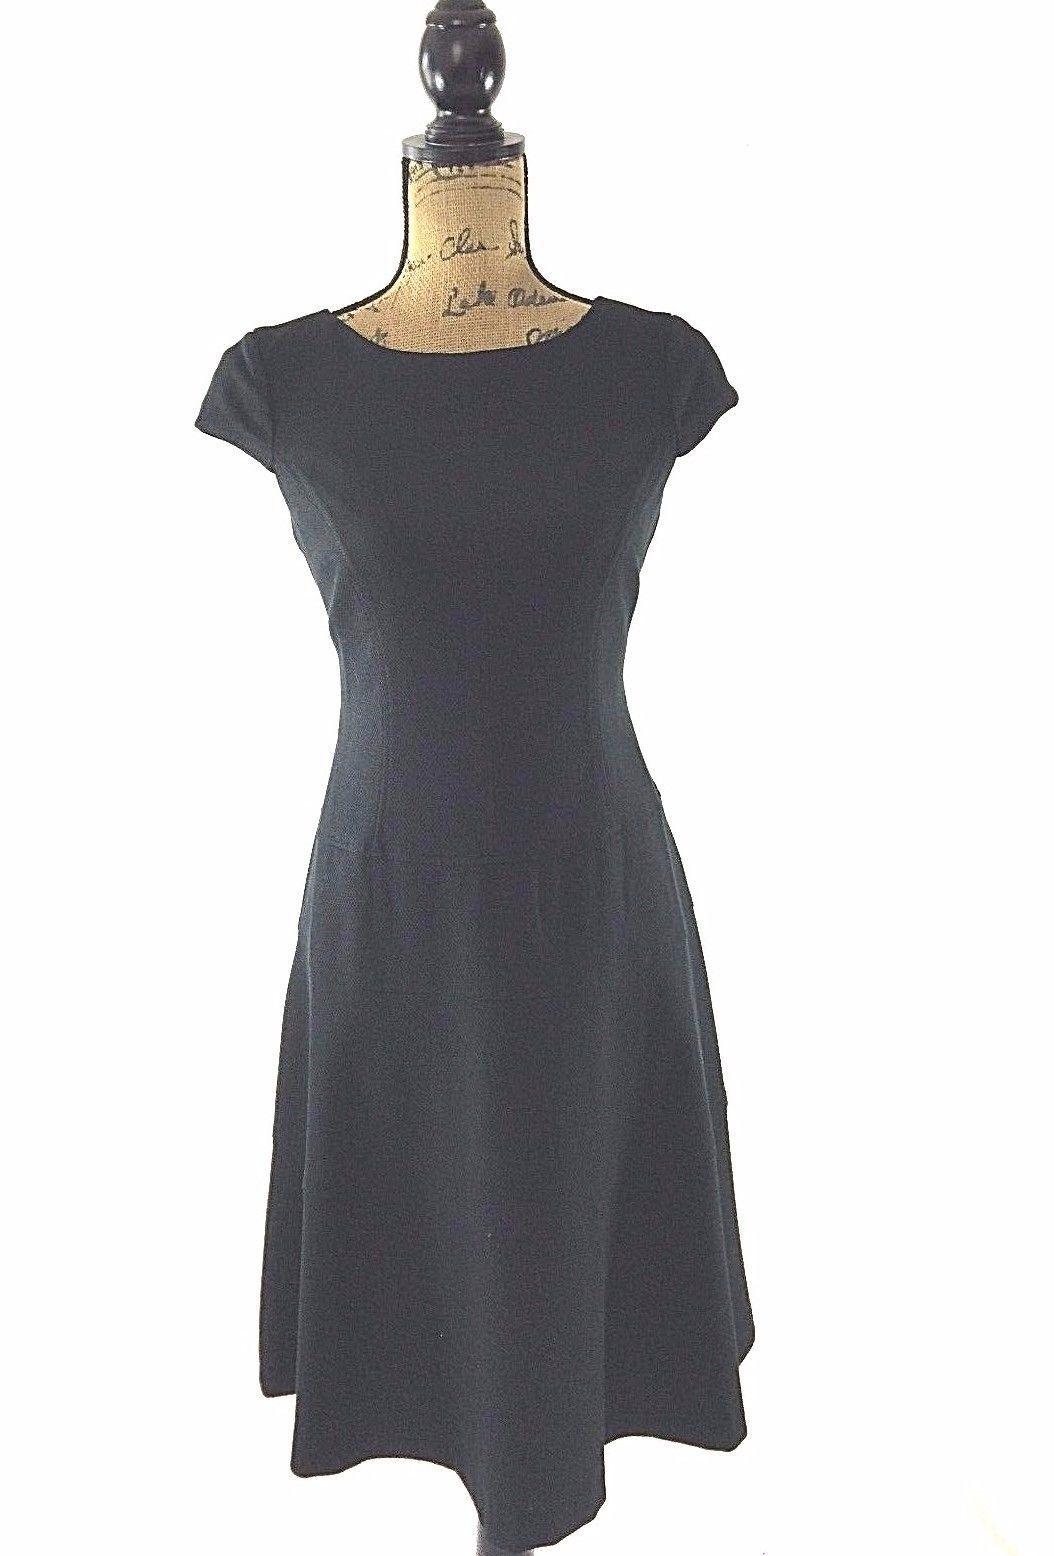 Anne Klein dress 6 medium classic black texture cap sl A line tier lined work LN